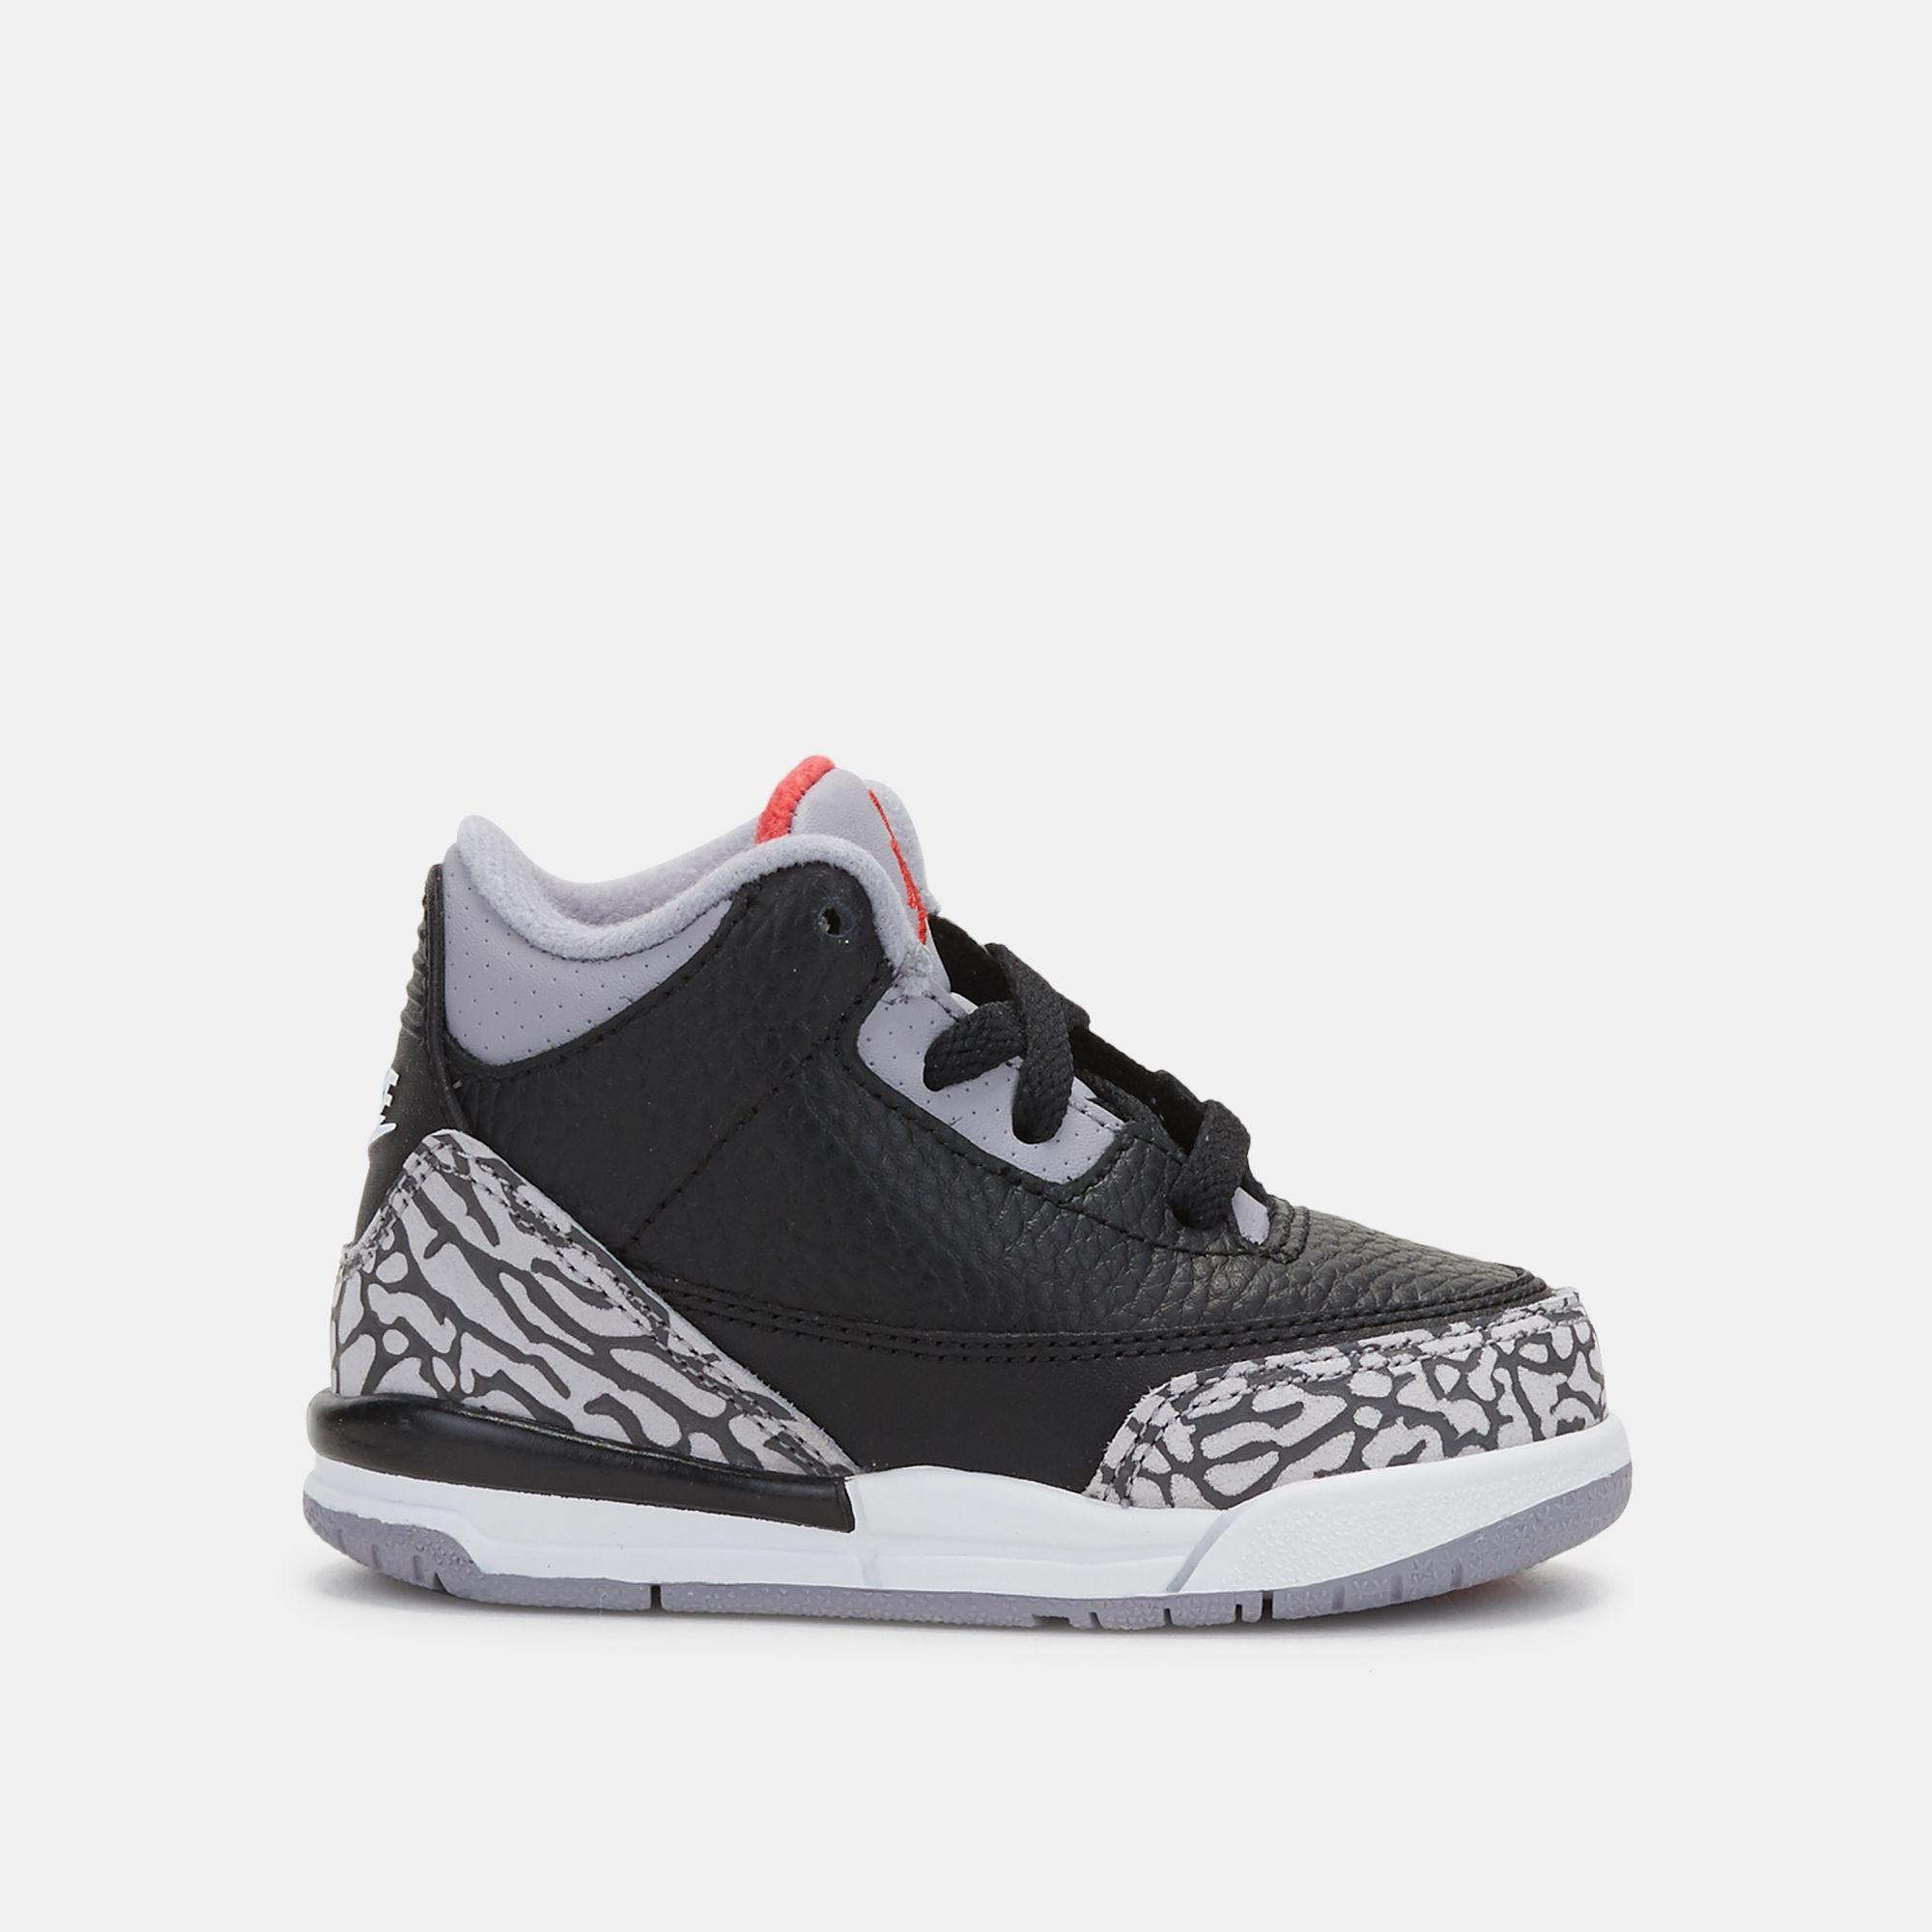 34efb174b253 Jordan Kids  Air Jordan 3 OG Retro Black Cement